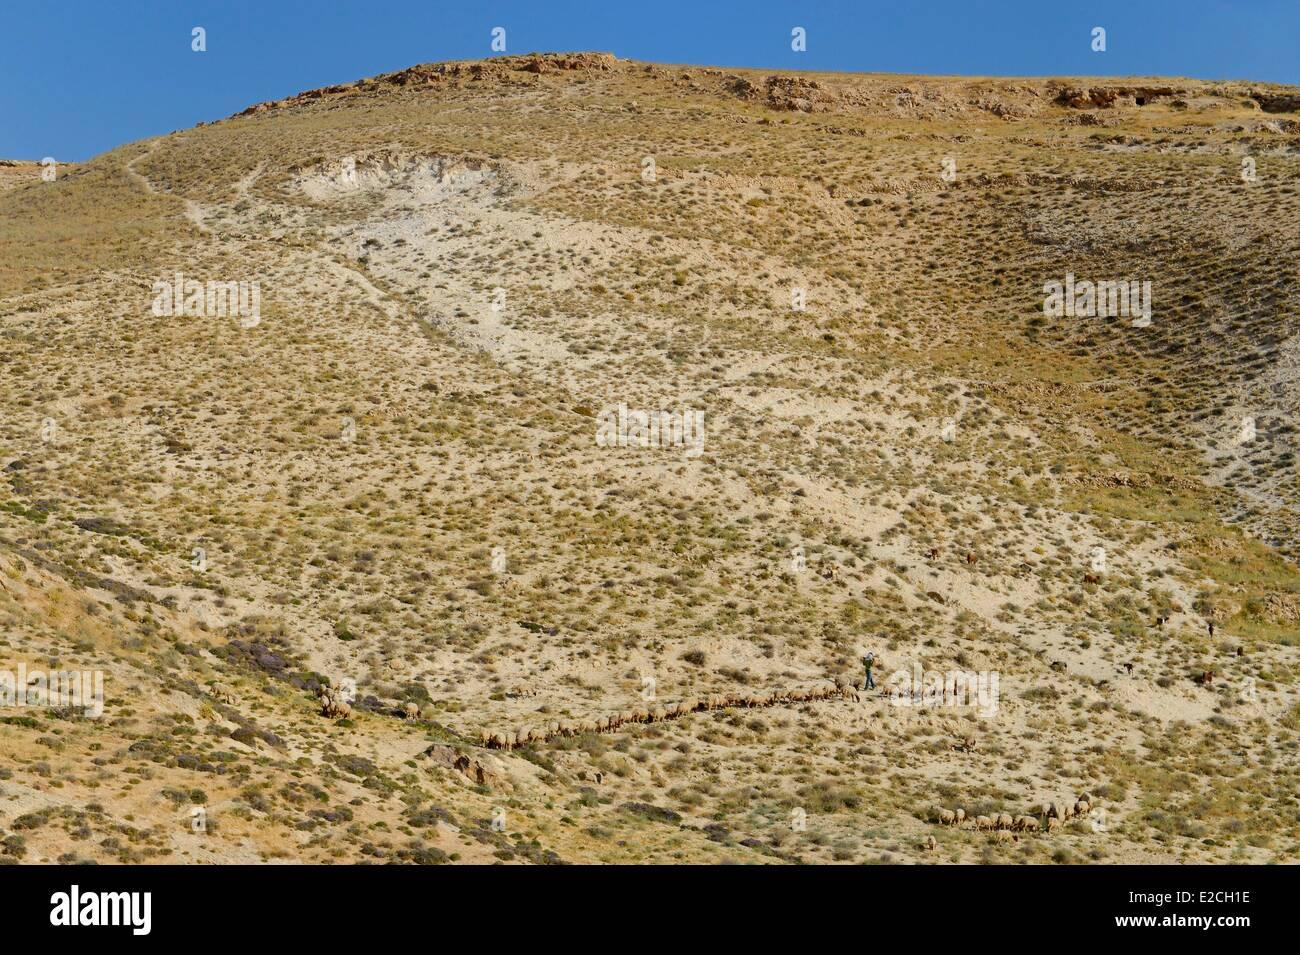 Palestine, West Bank (disputed territory), Bethlehem region, shepherd and his flock of sheep - Stock Image